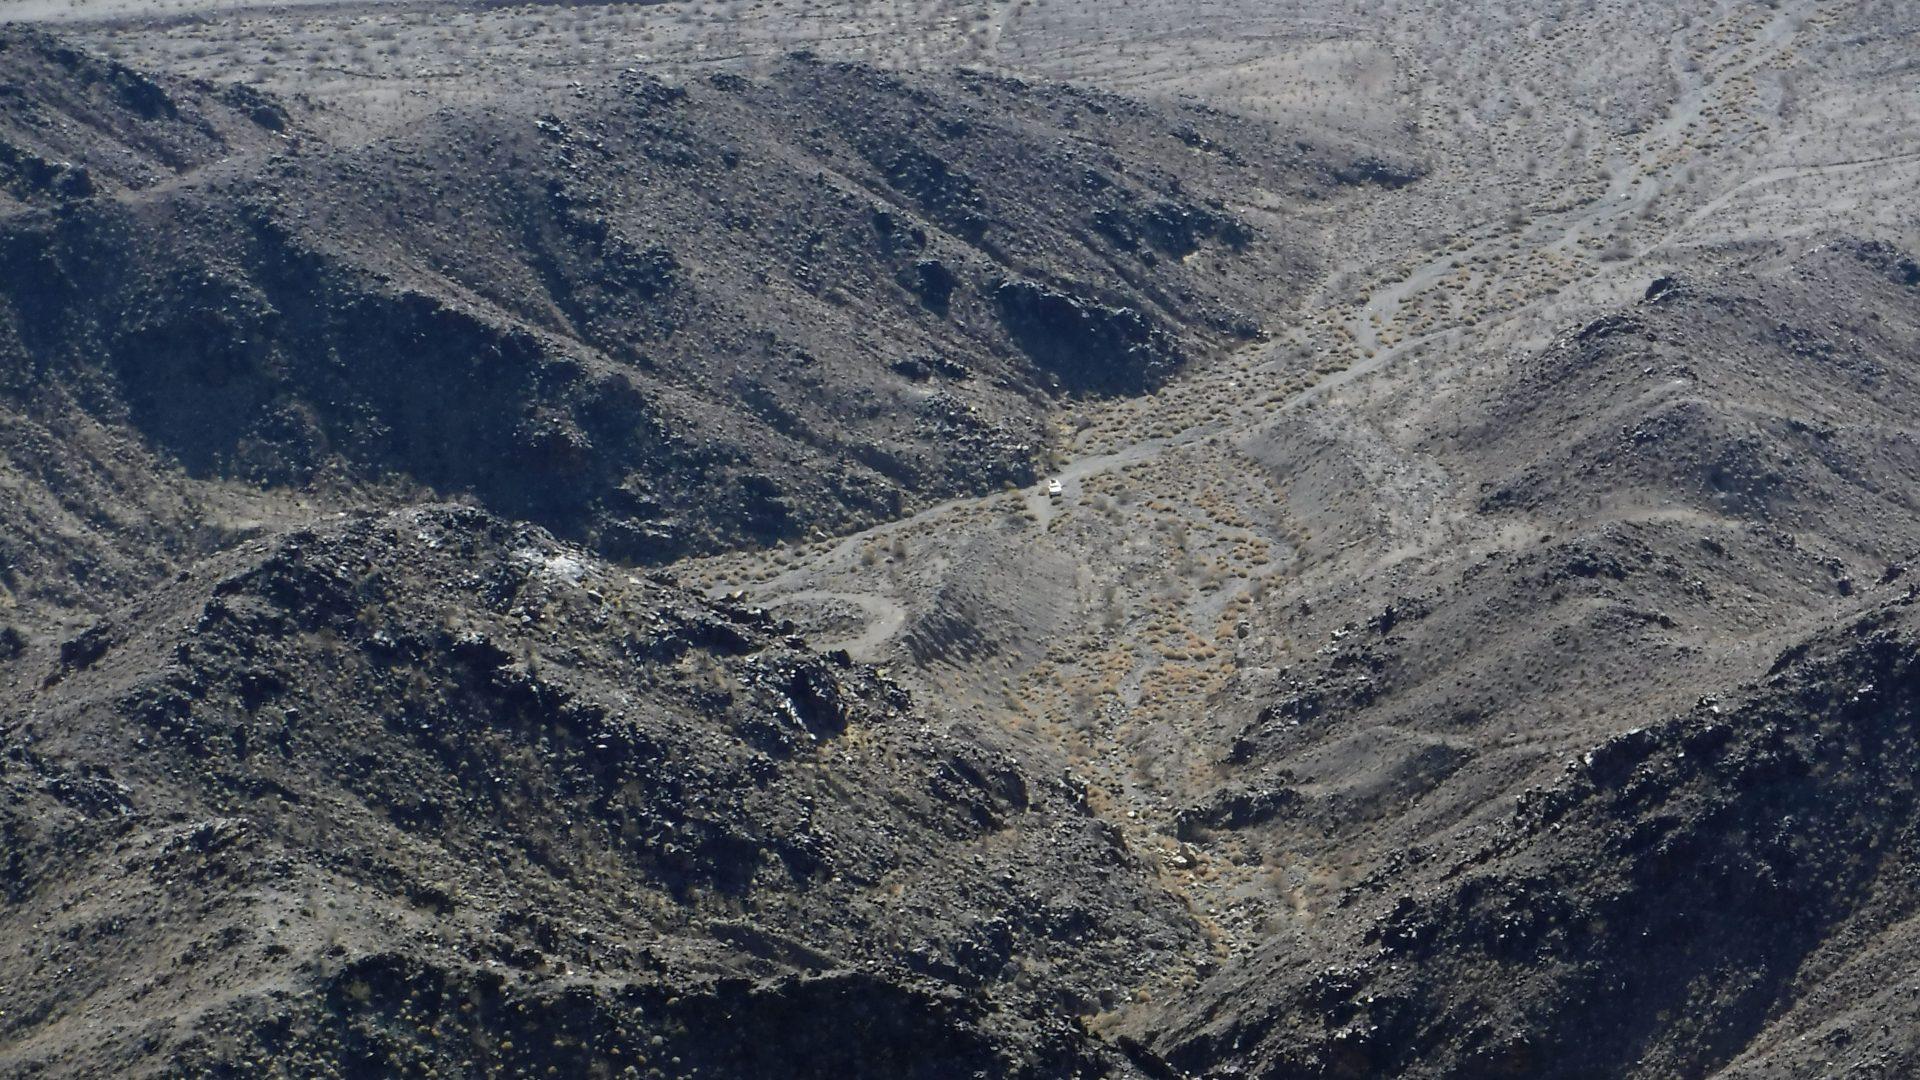 View down into a desert canyon